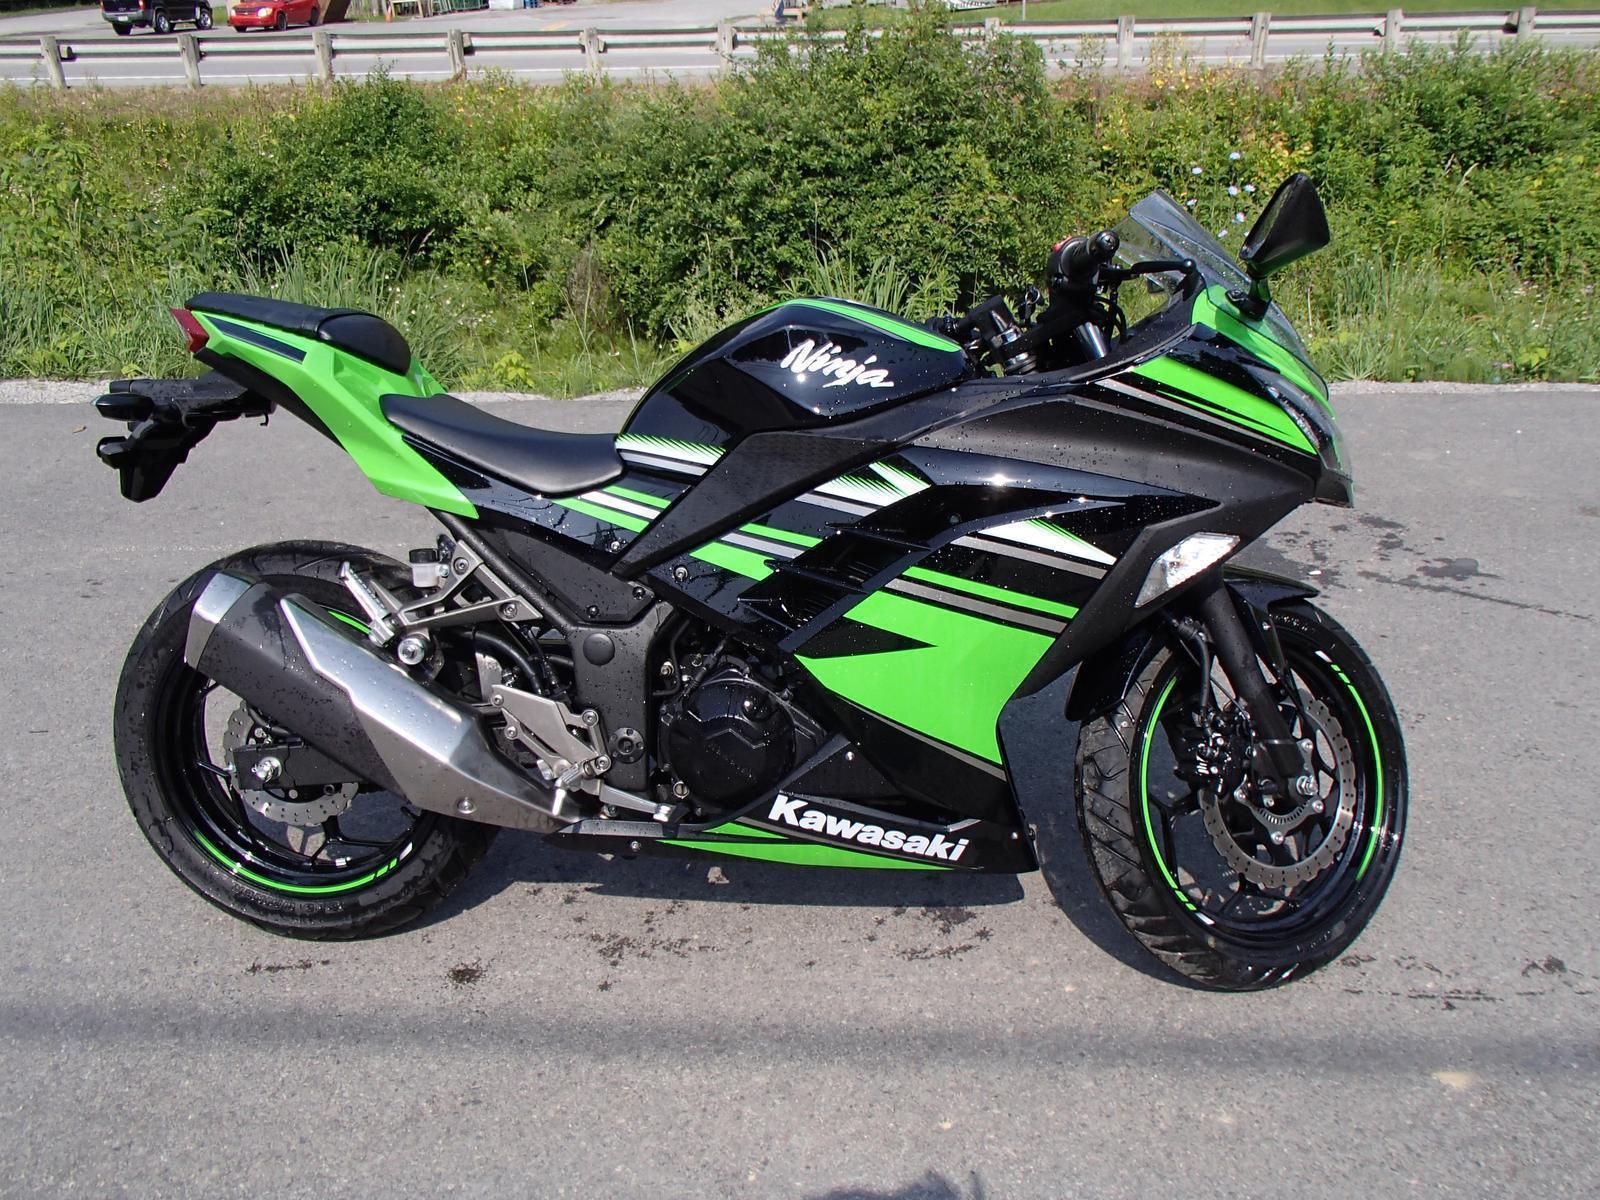 2016 Kawasaki Ninja 300 Abs Krt Edition For Sale In Elkins Wv